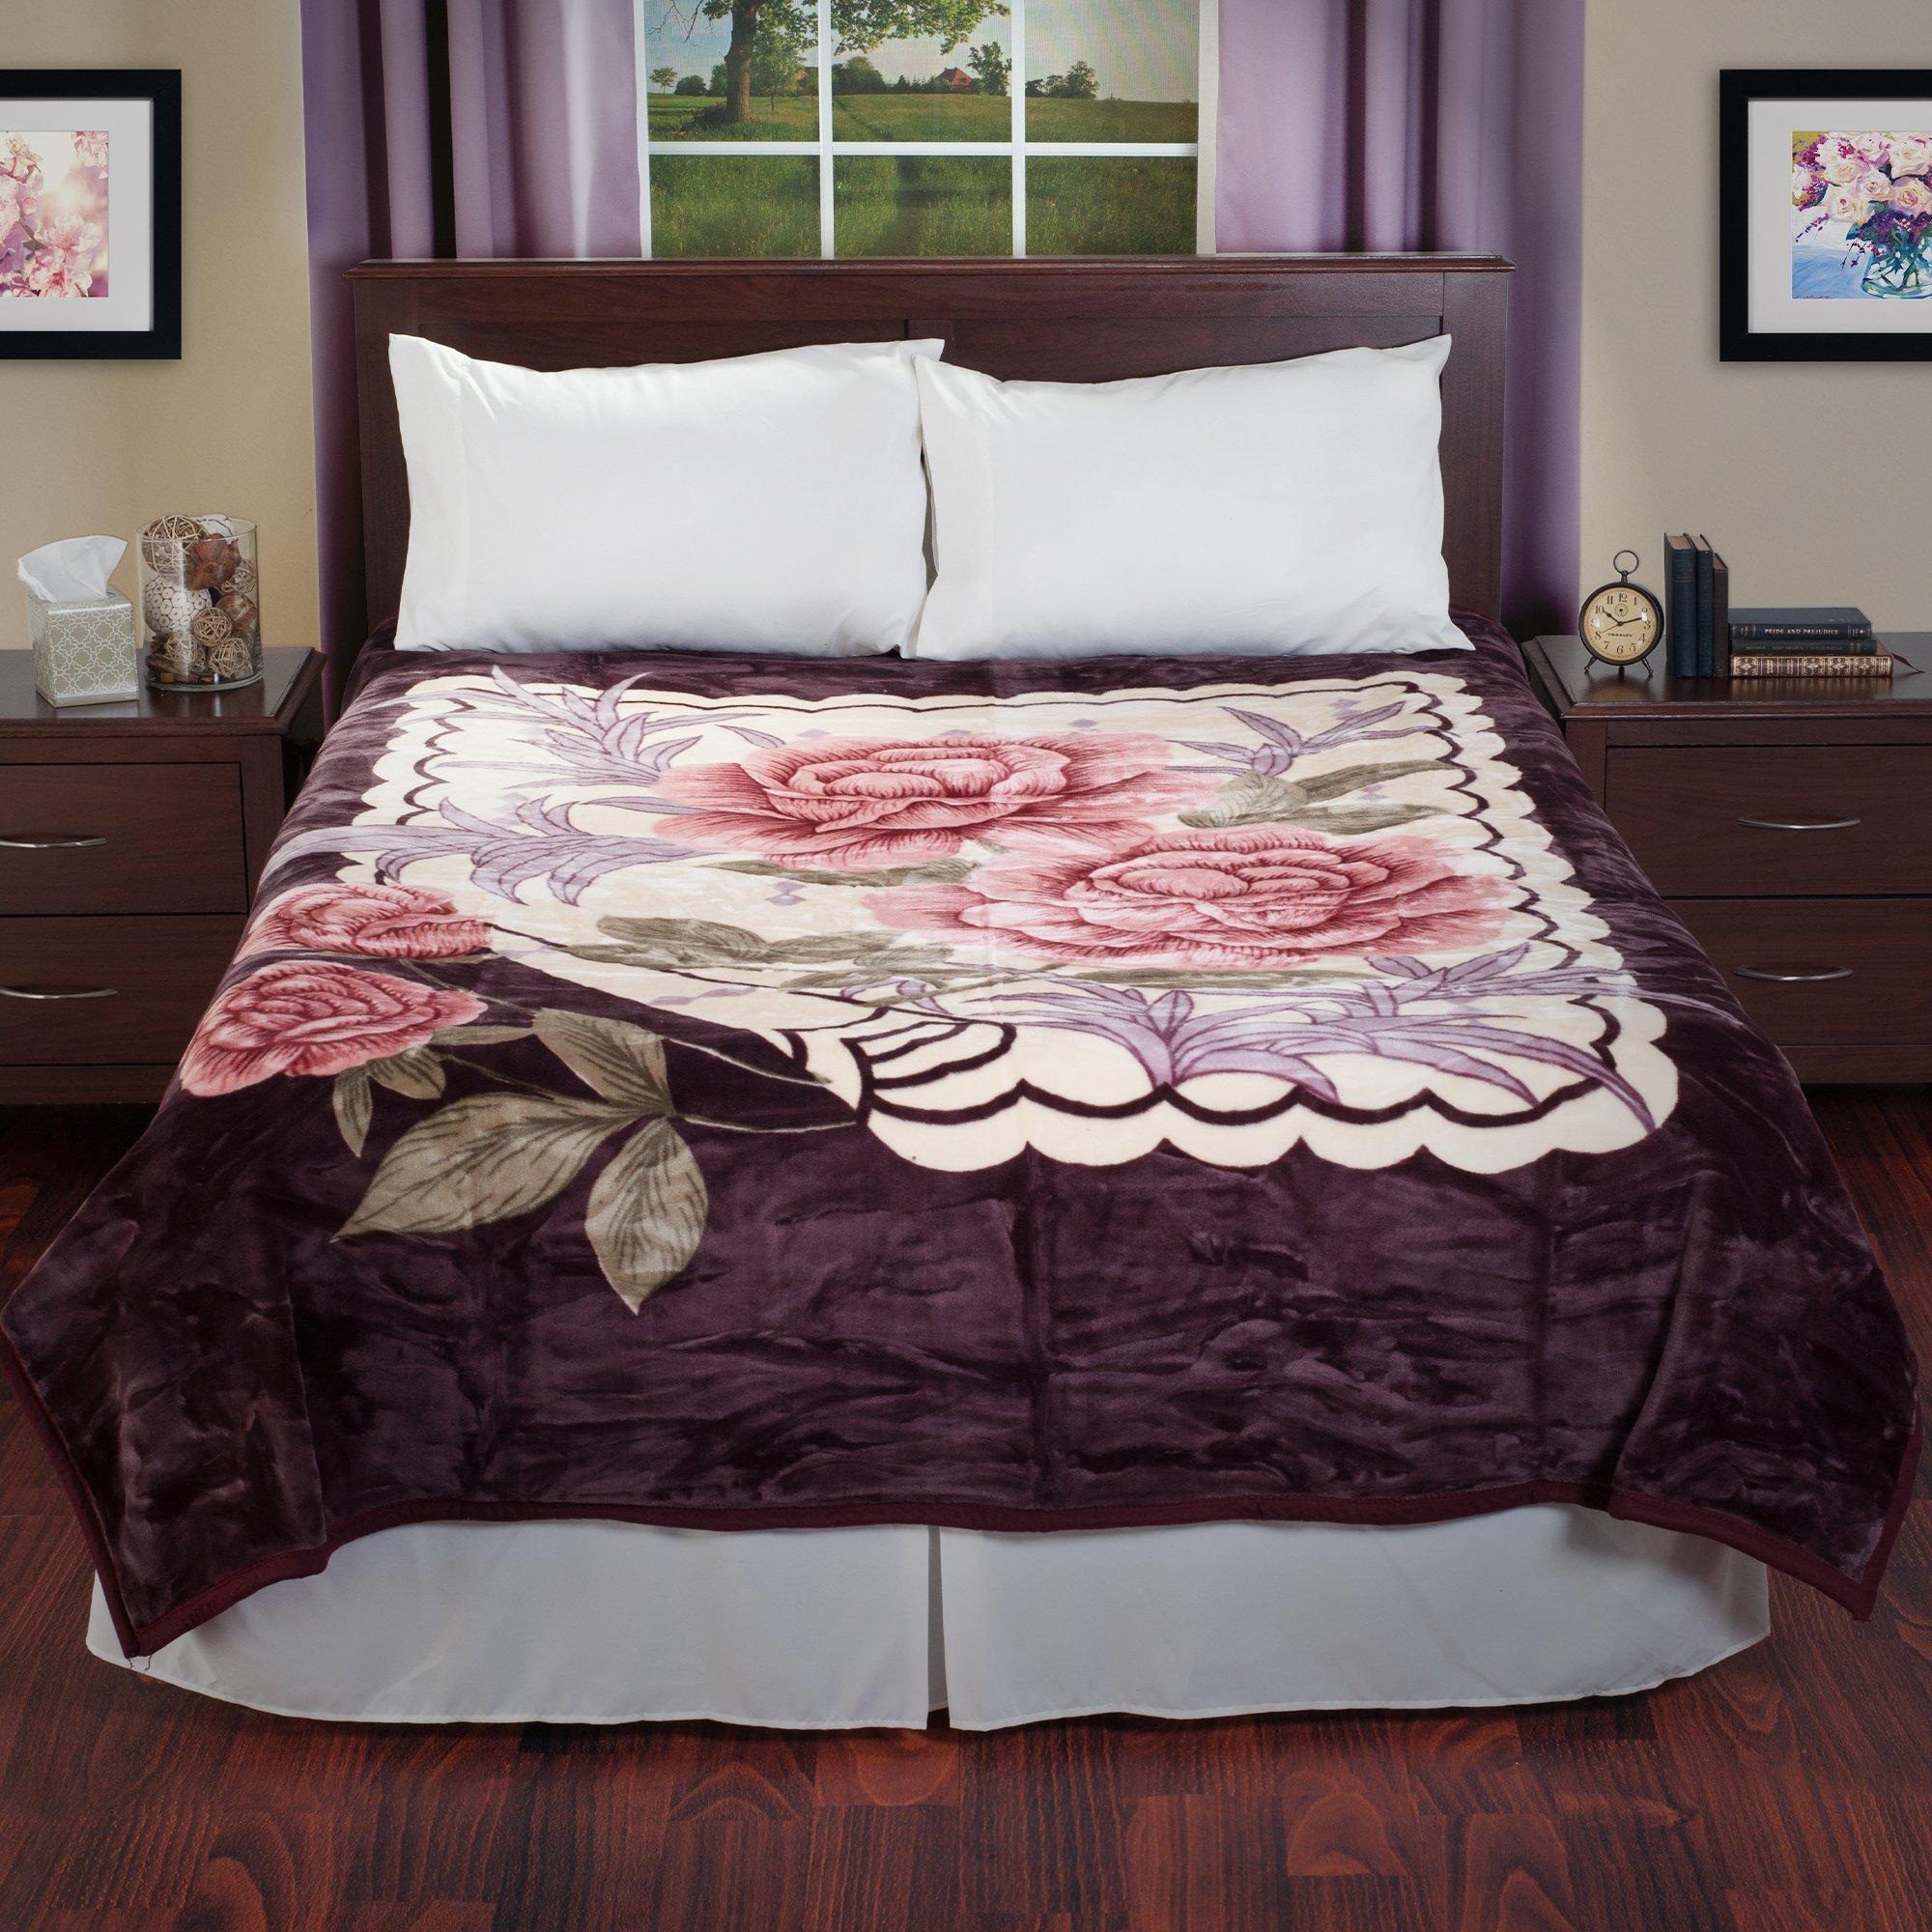 Lavish Home Heavy Thick Blanket